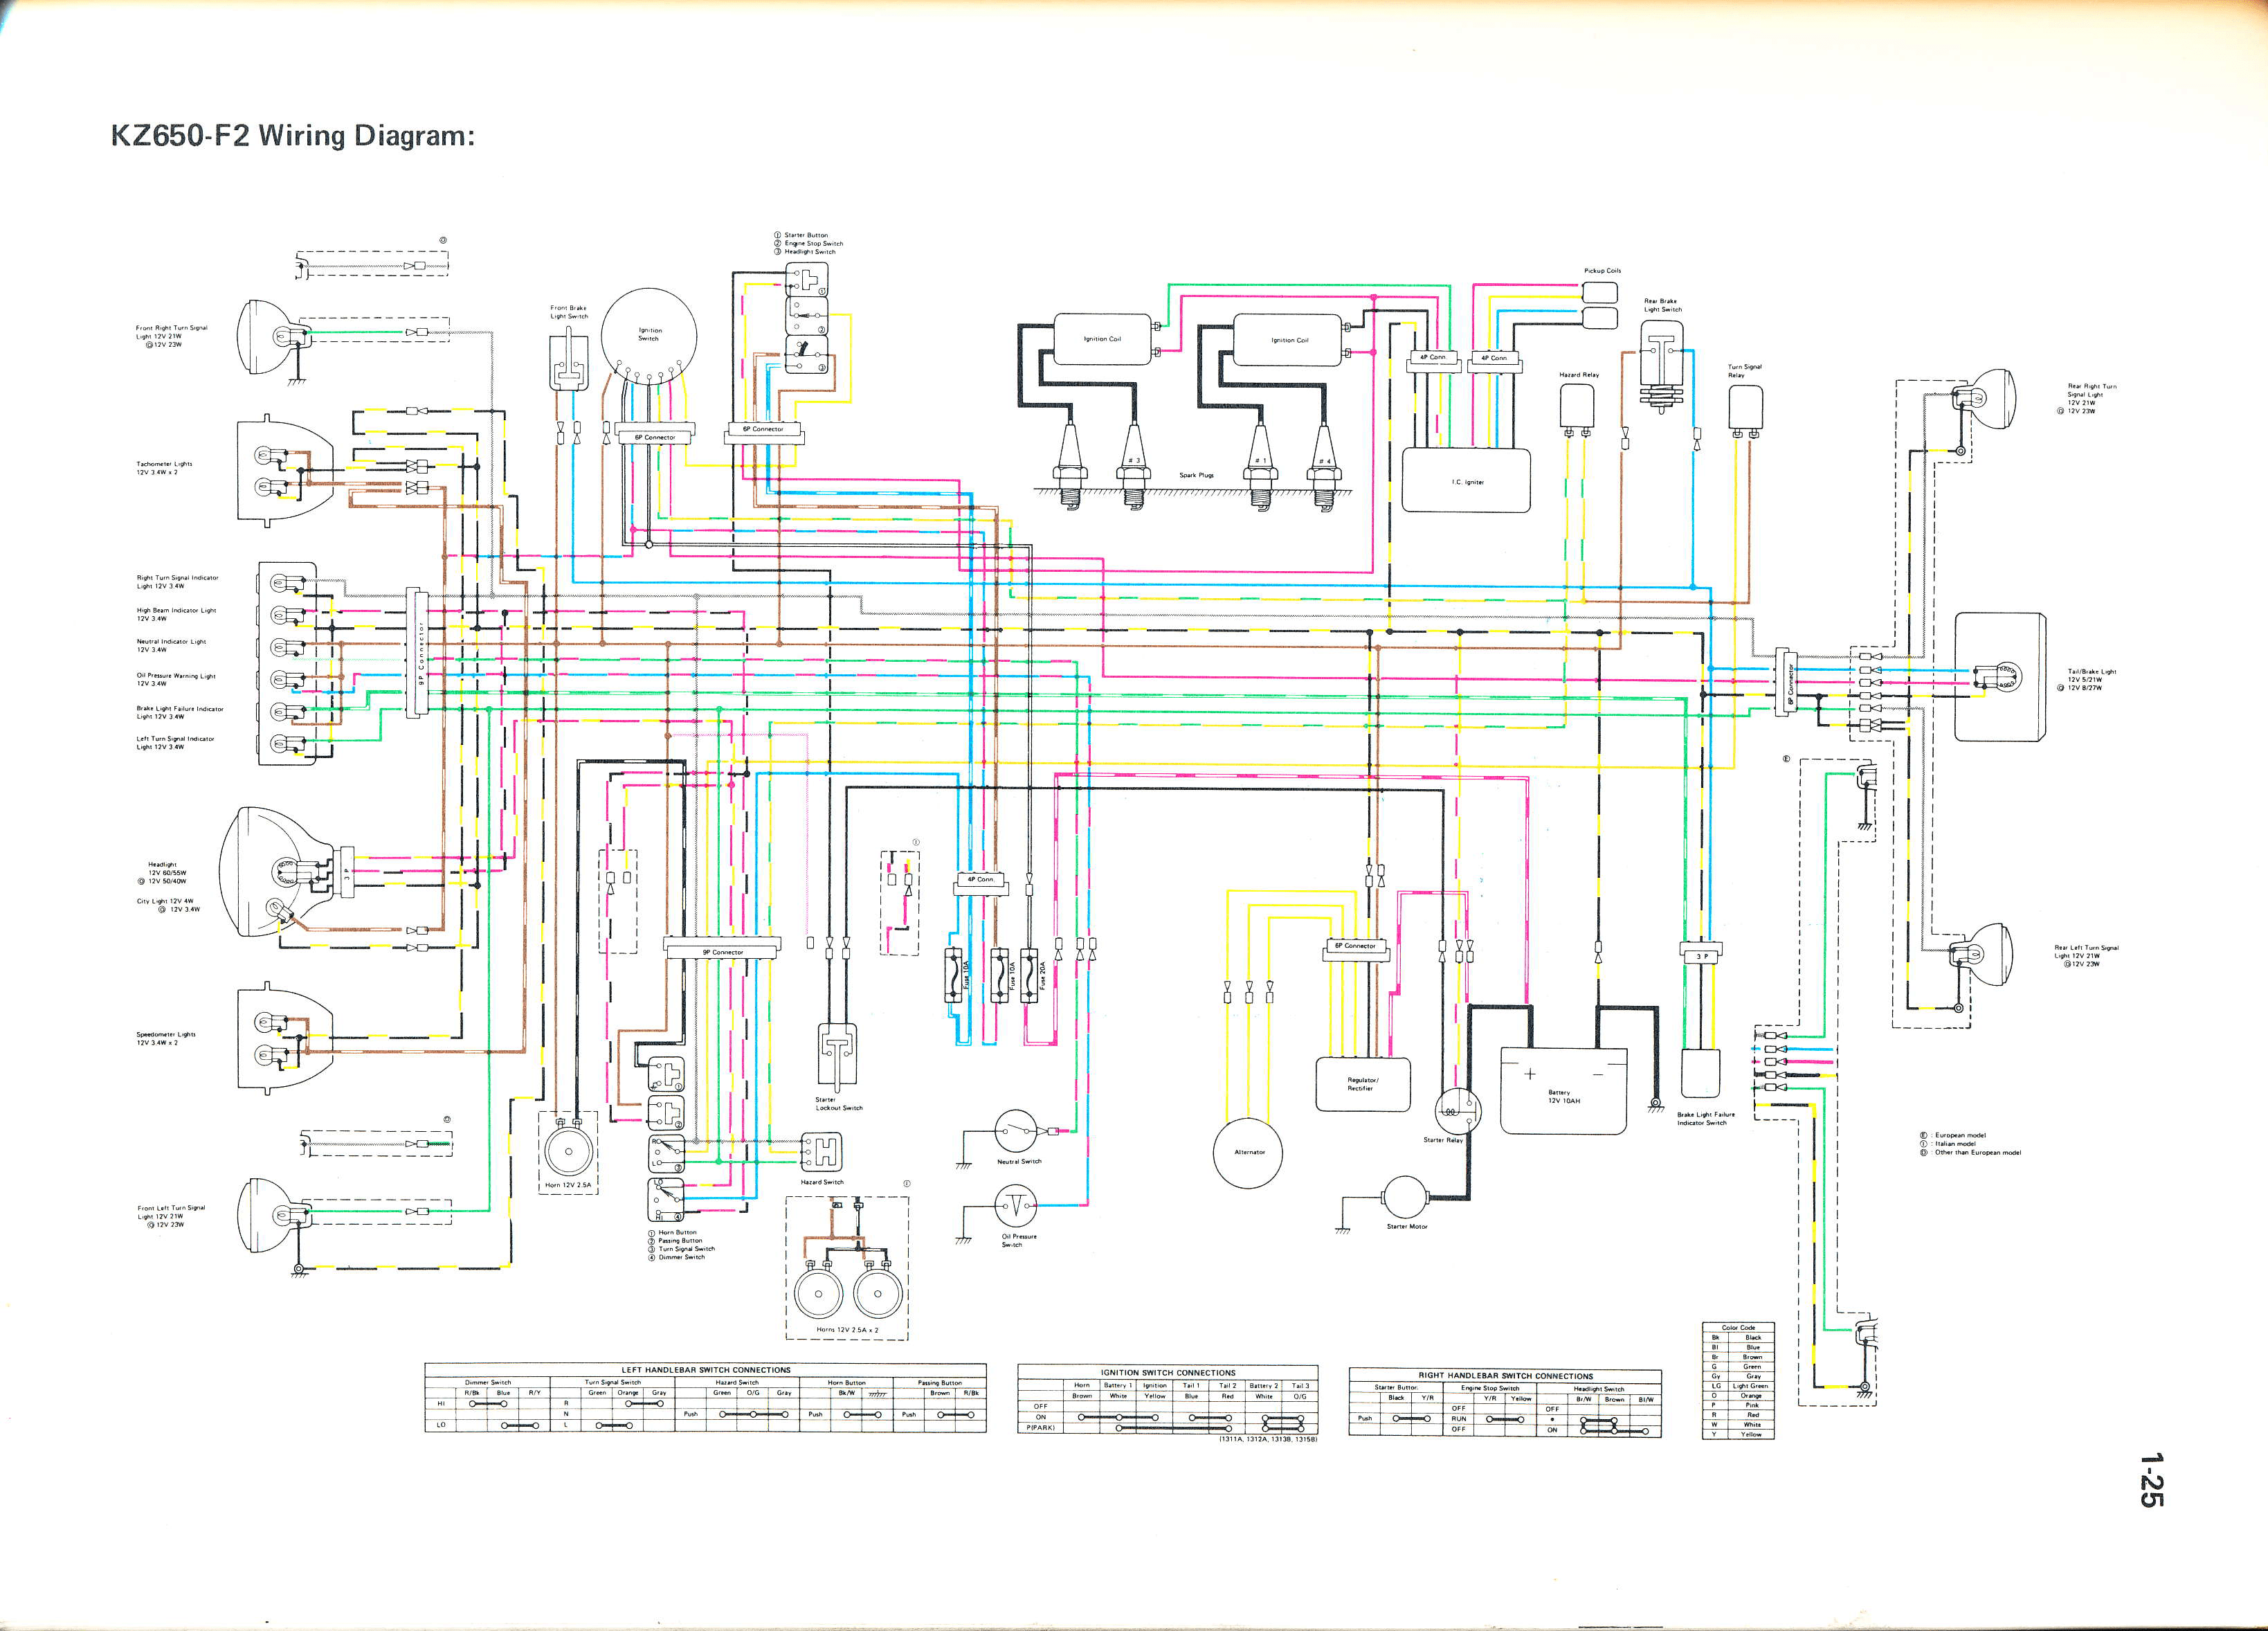 OEM Service Manual KZ650 F2?resize\\\=665%2C478 2001 honda 400ex wiring diagram tamahuproject org 400ex headlight wiring diagram at mifinder.co